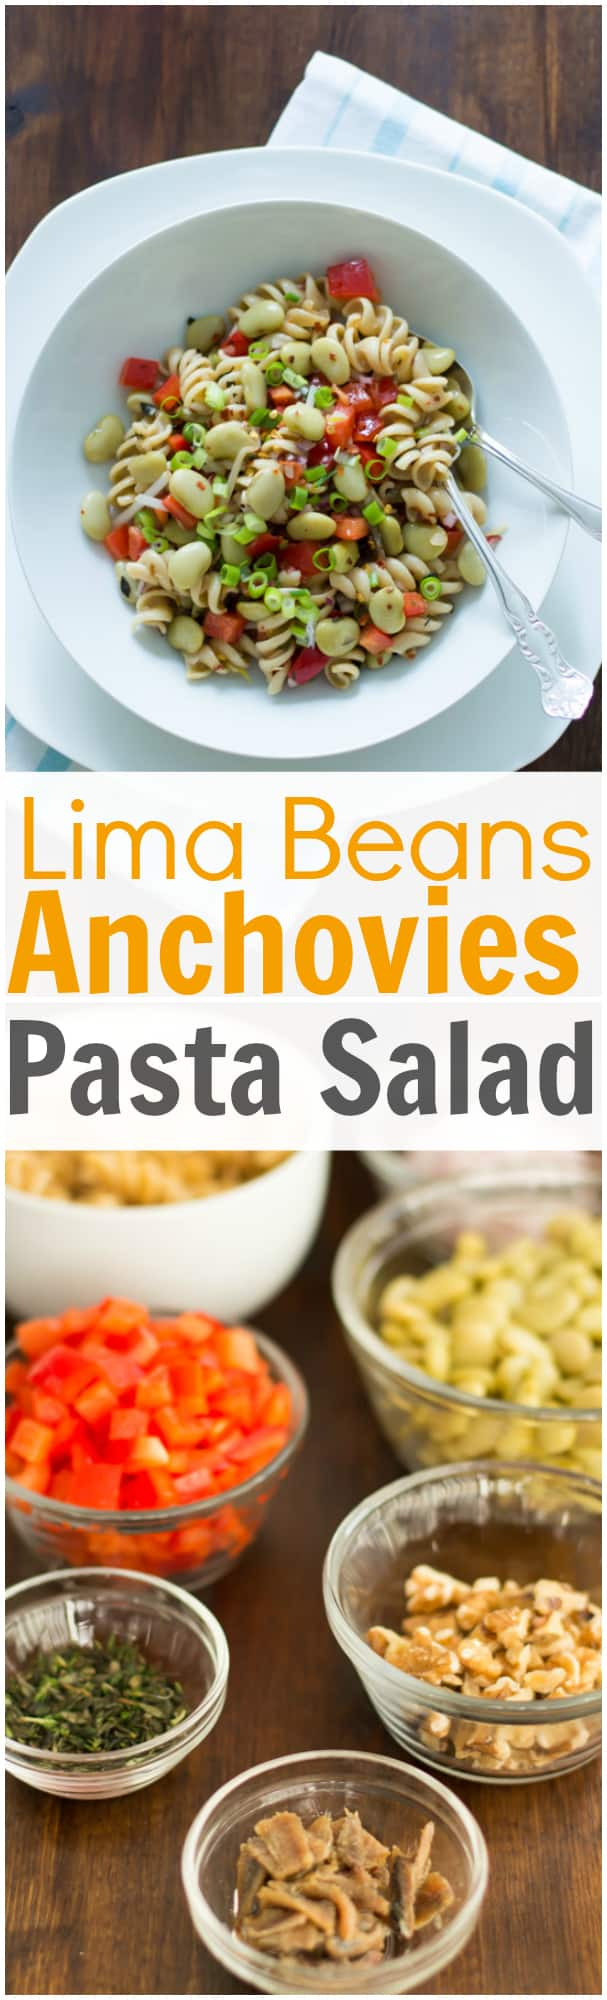 Lima Beans Anchovies pasta Salad